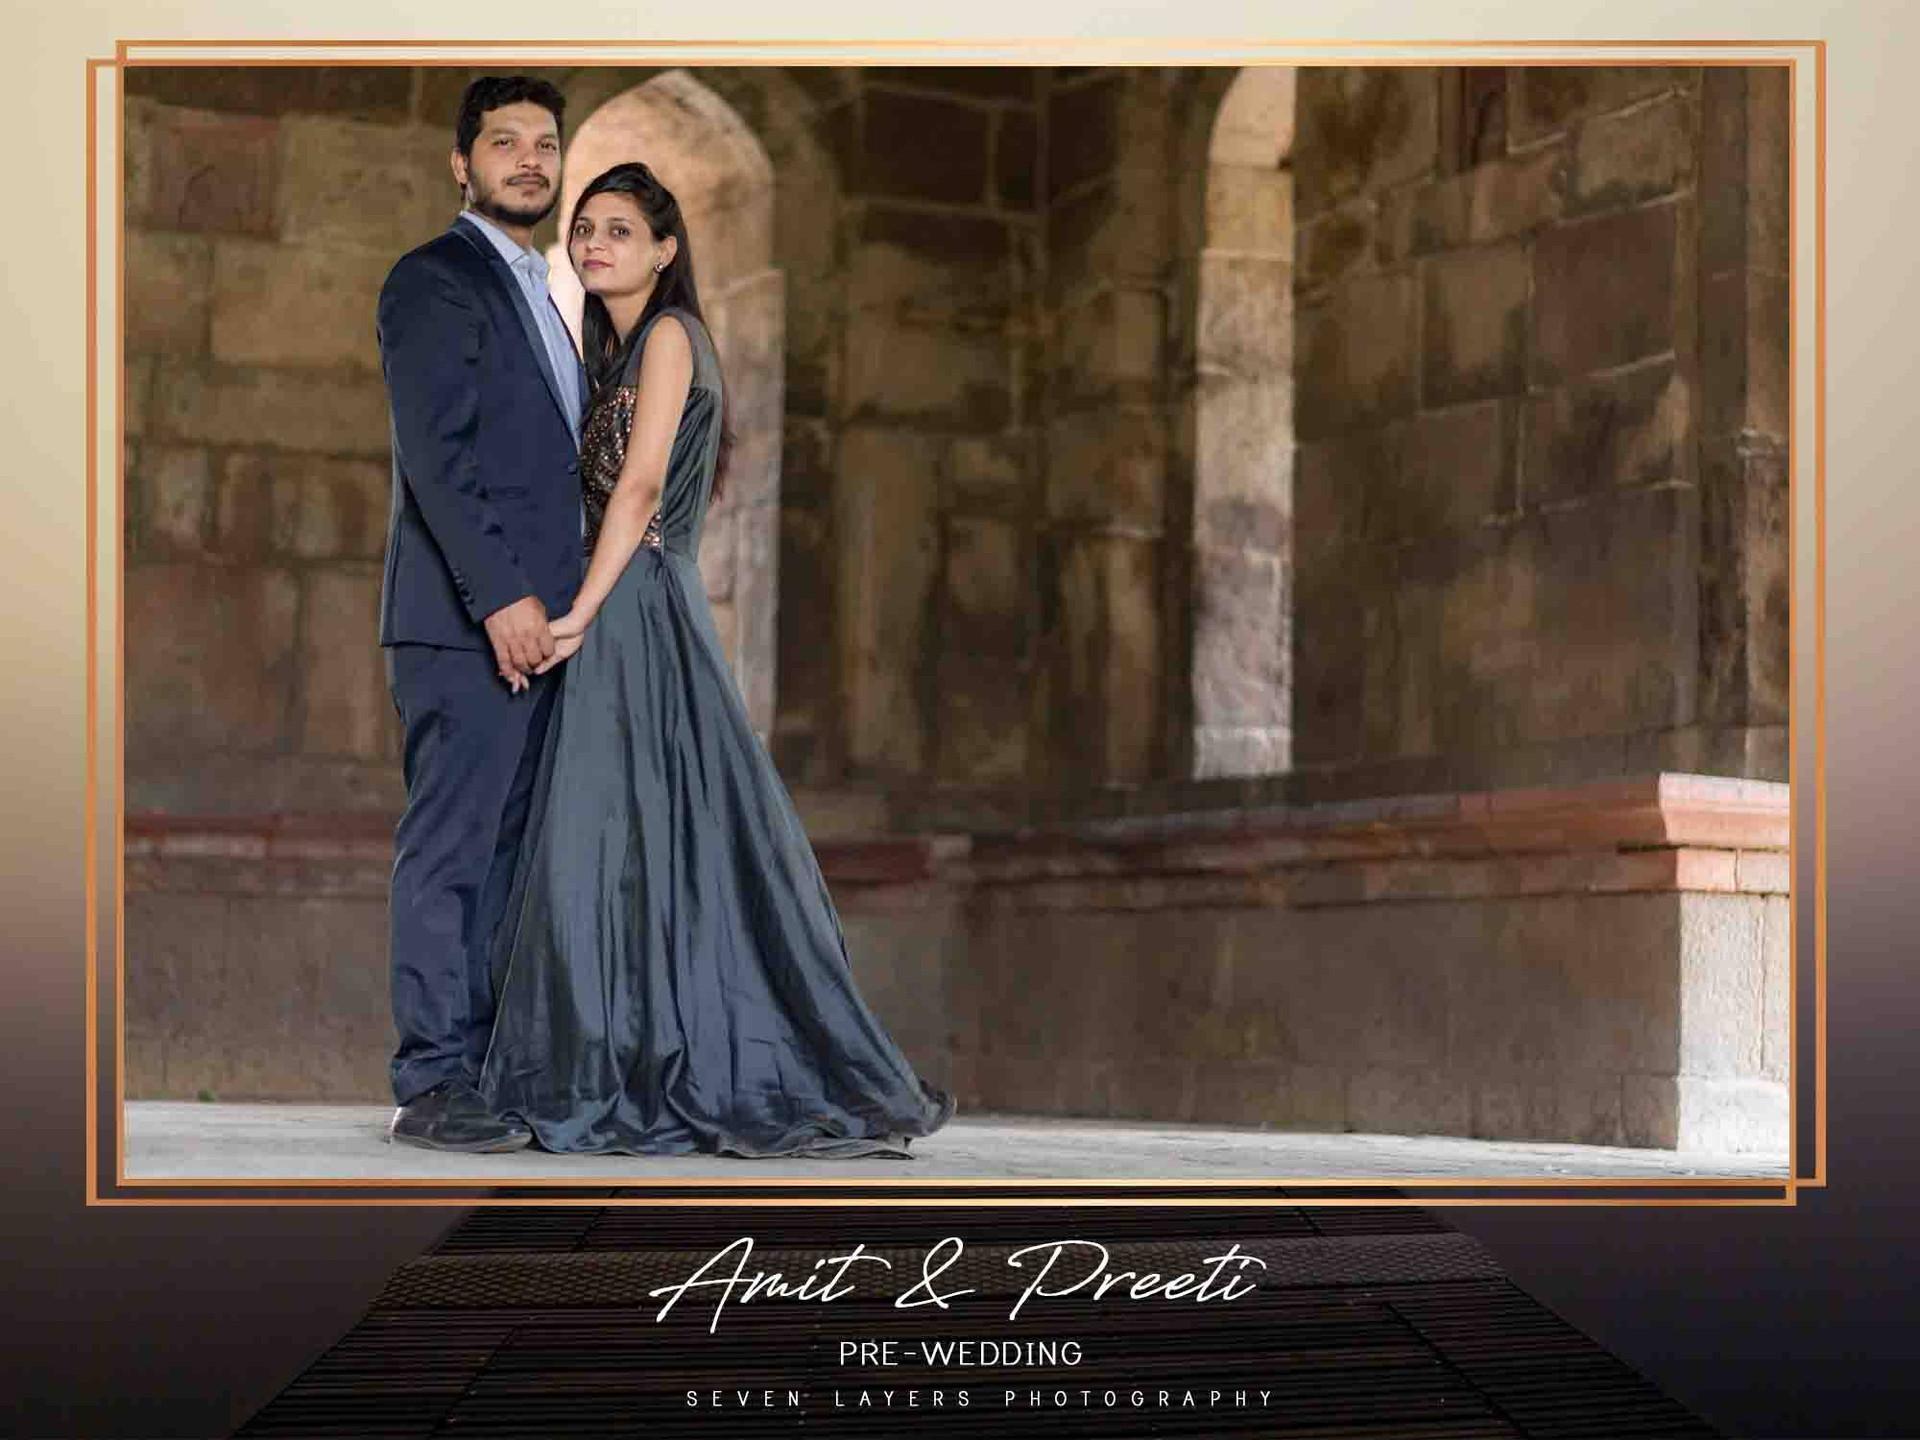 Amit and Preeti Pre-Wedding_Seven layers Photography (10)